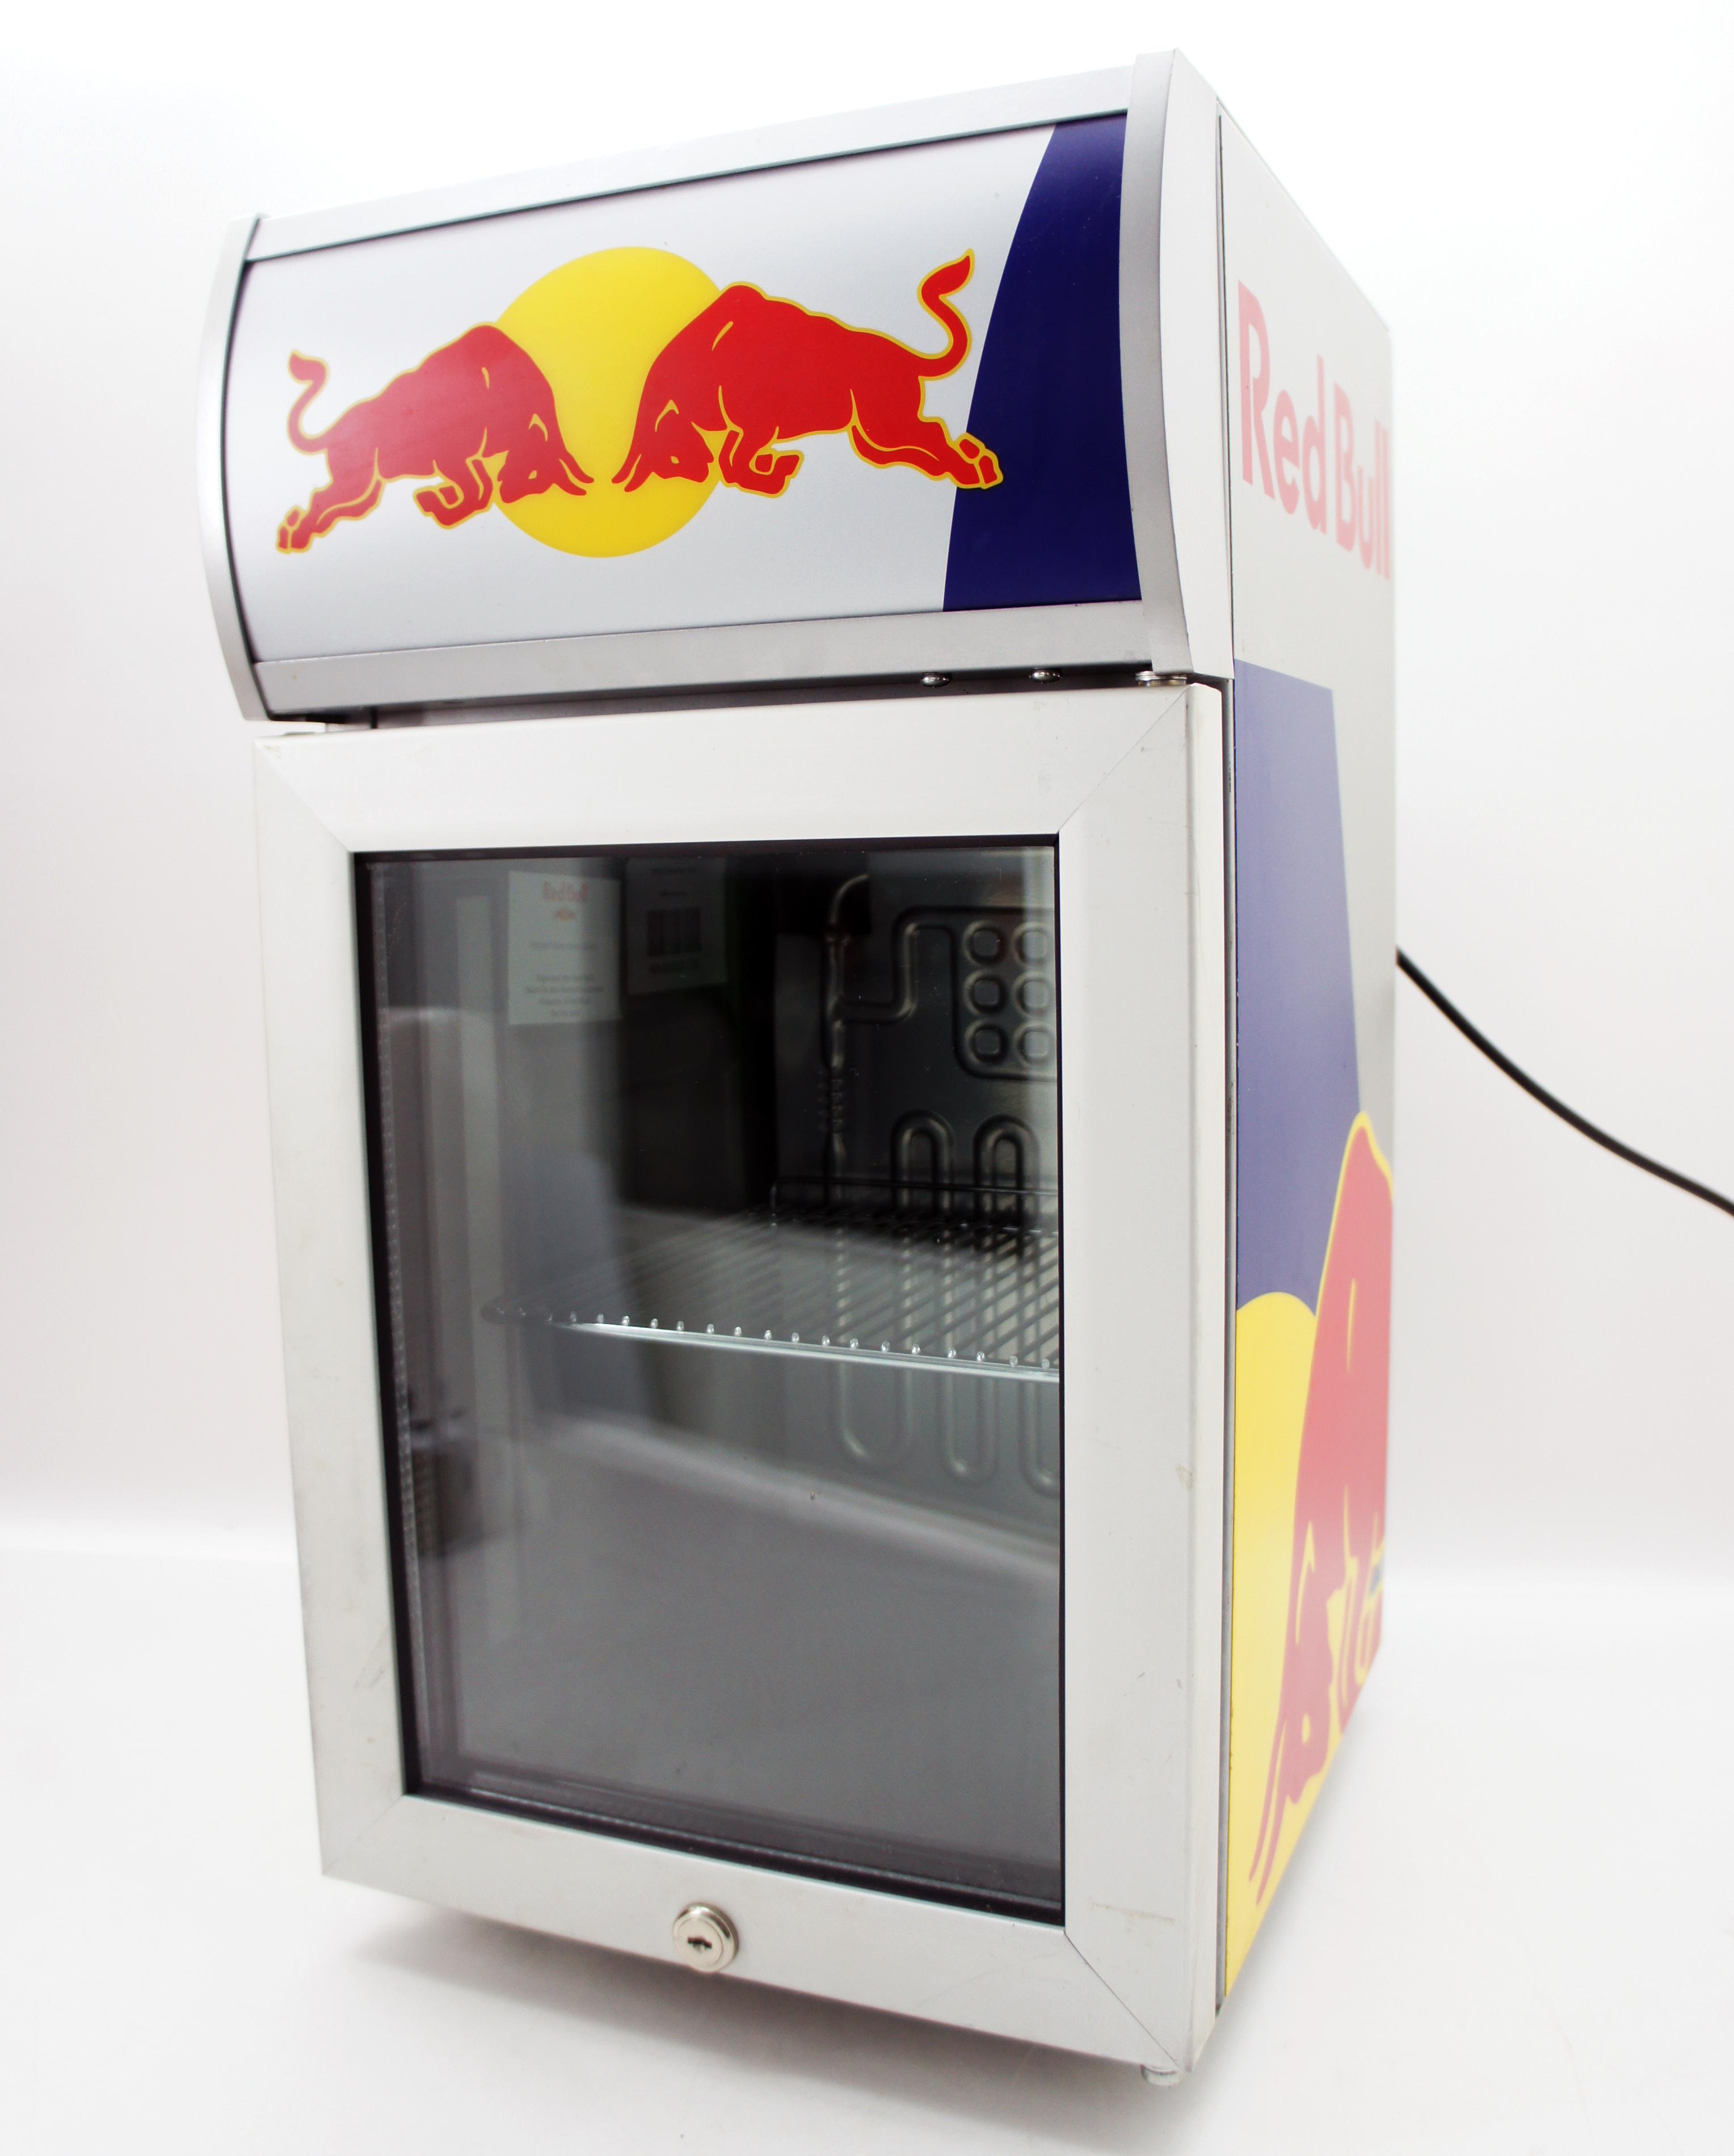 Kühlschrank Blinkt Led Siemens - Lula Wade Blog